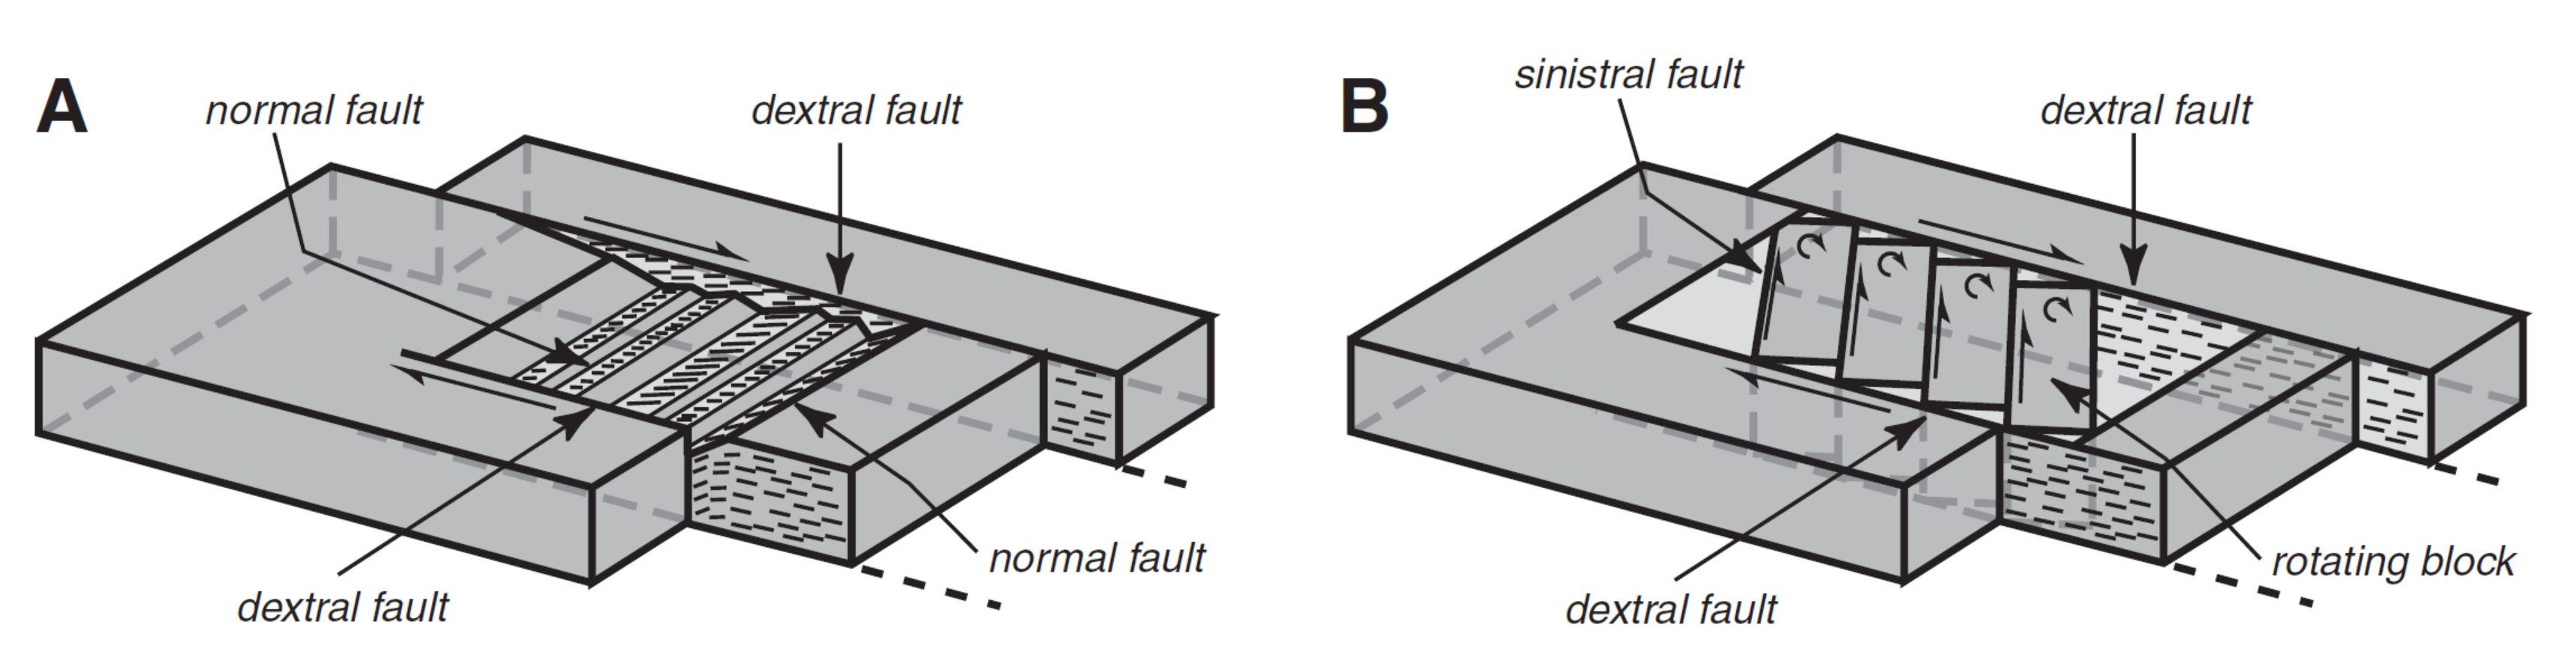 strike slip fault block diagram narva 7 pin flat wiring earthquake report nevada jay patton online